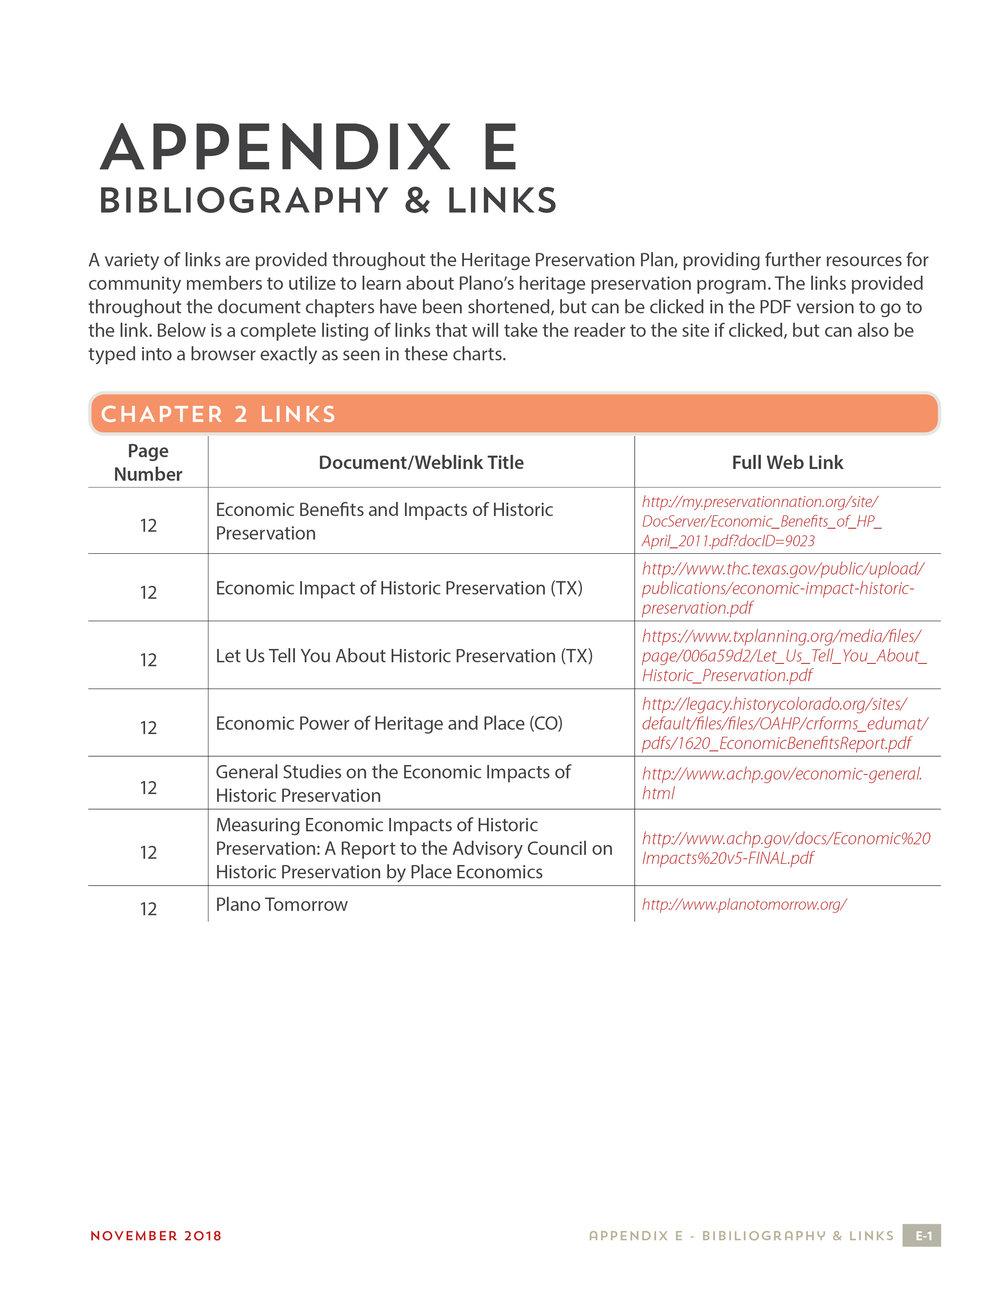 Appendix E - Bibliography & Links